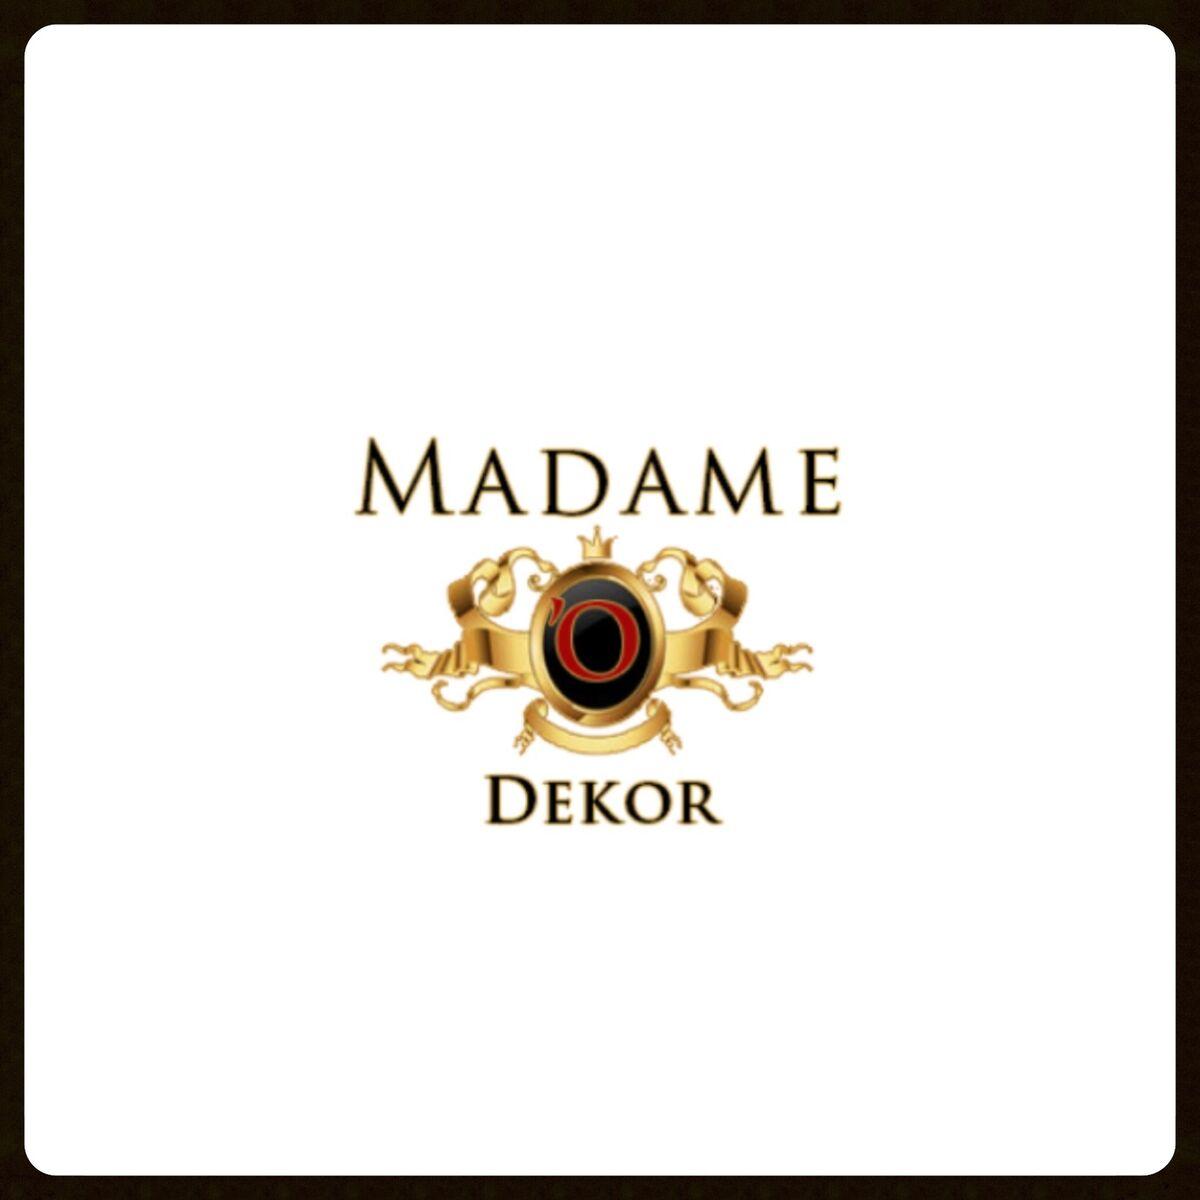 "MADAME ""O"" DEKOR - KERAMIK"